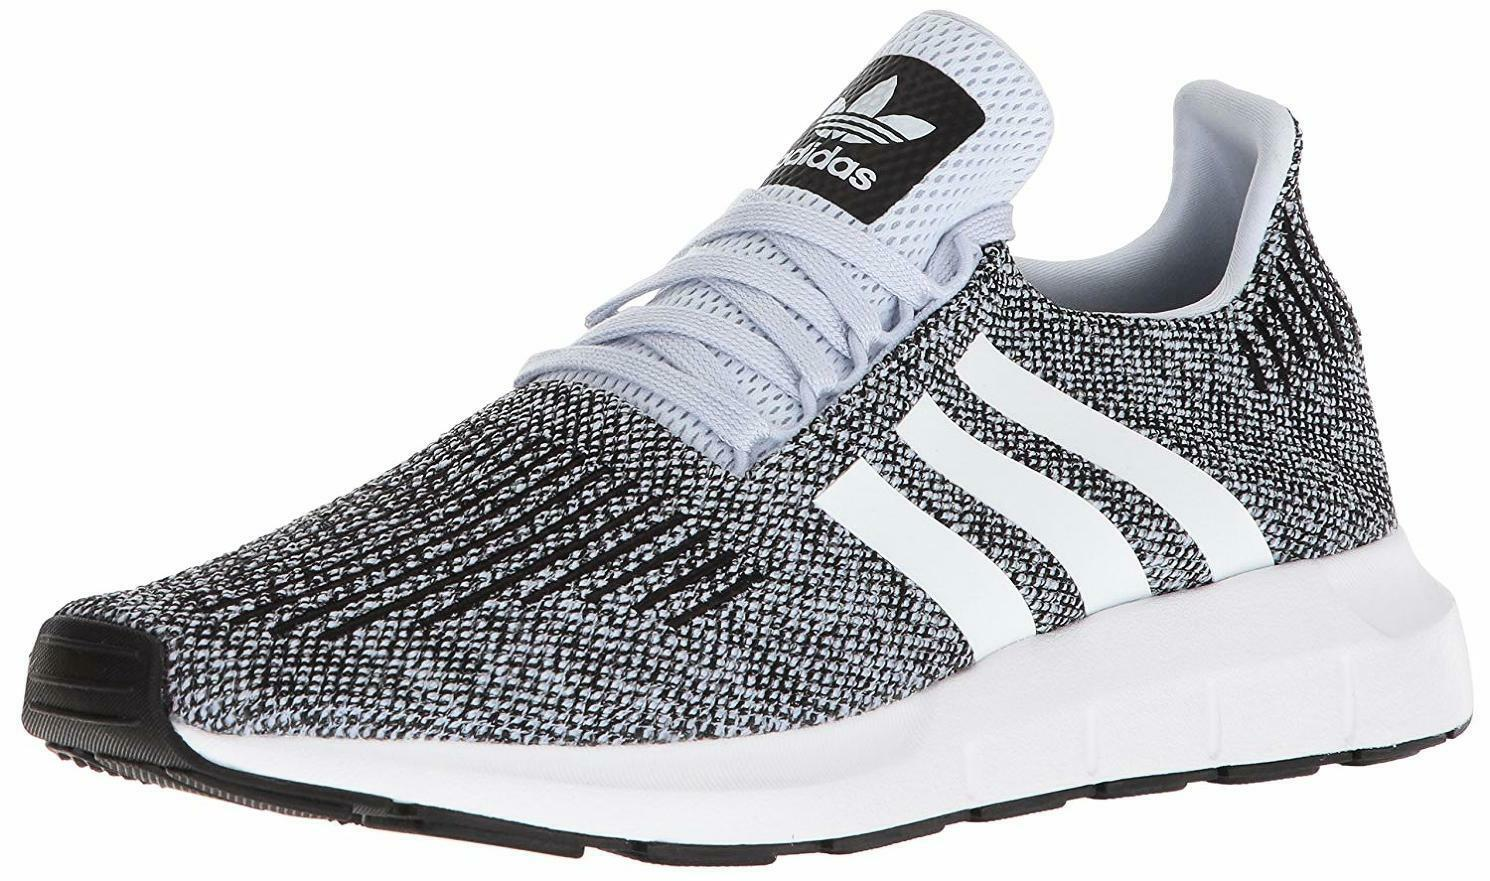 Adidas Men's Swift Running shoes - Choose SZ color